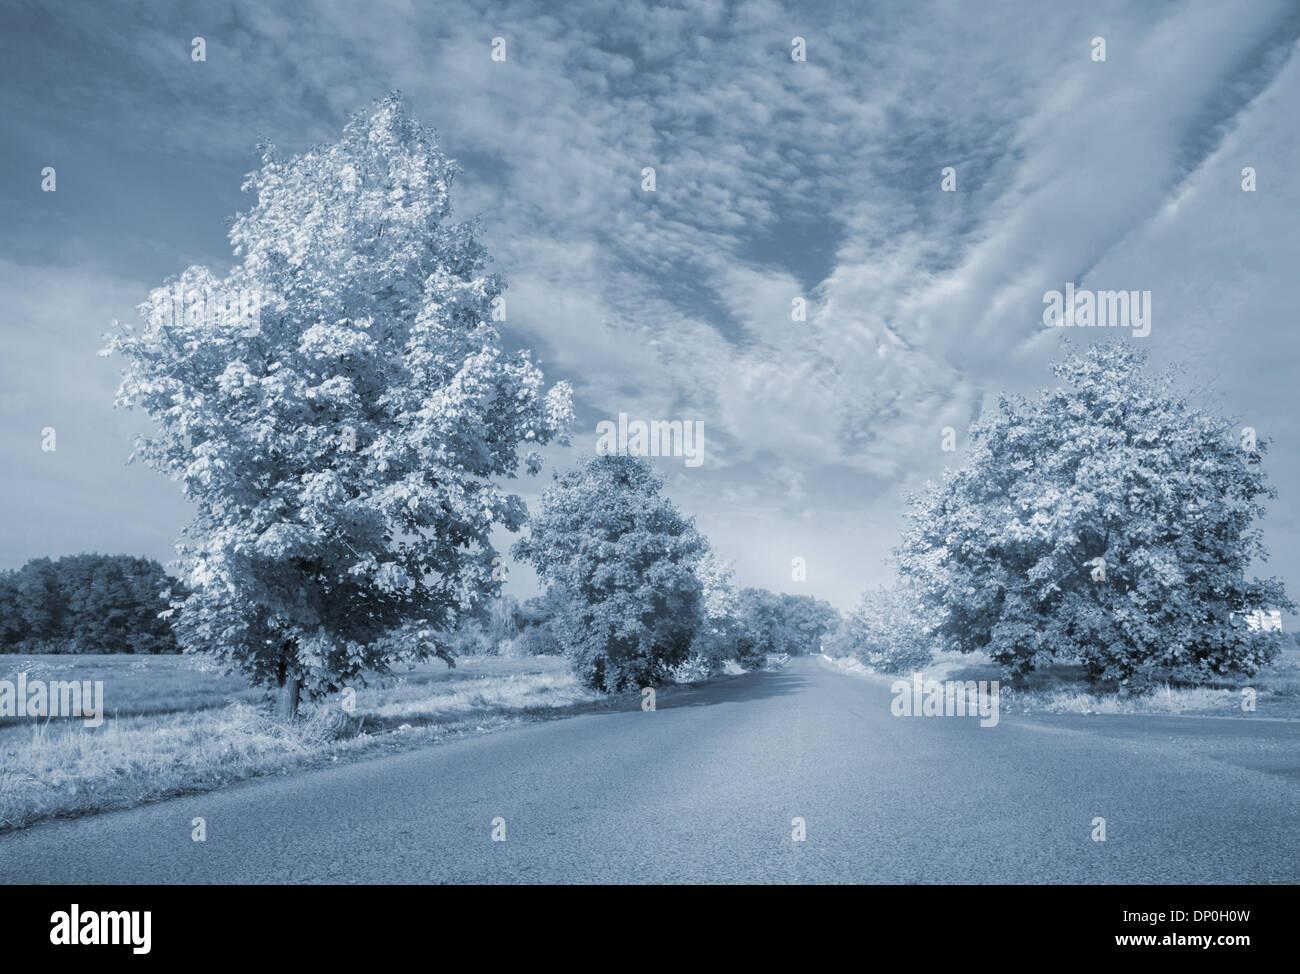 Warped road - Stock Image